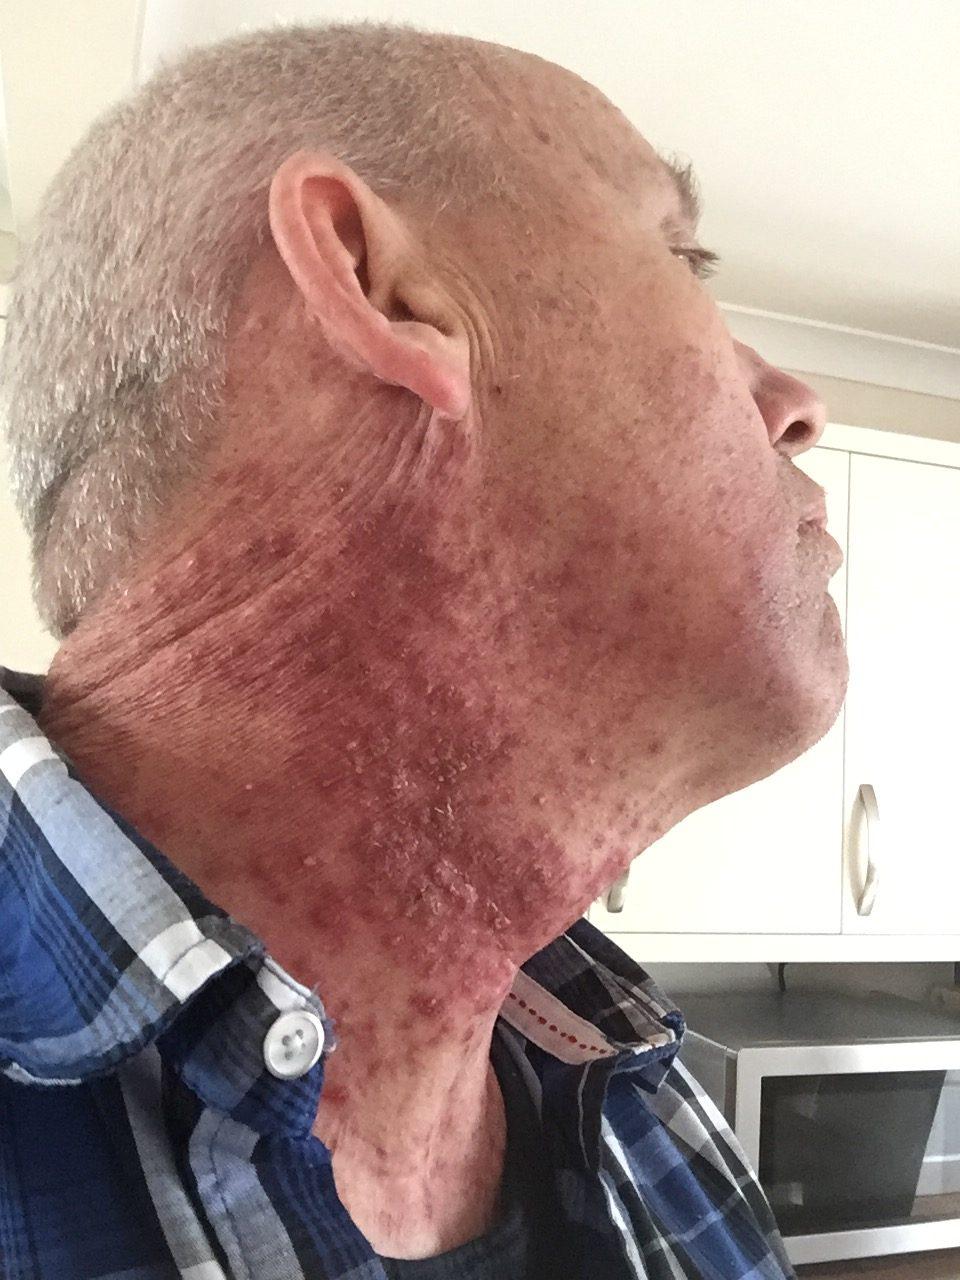 hpv throat cancer treatment side effects que es la papilomatosis vestibular